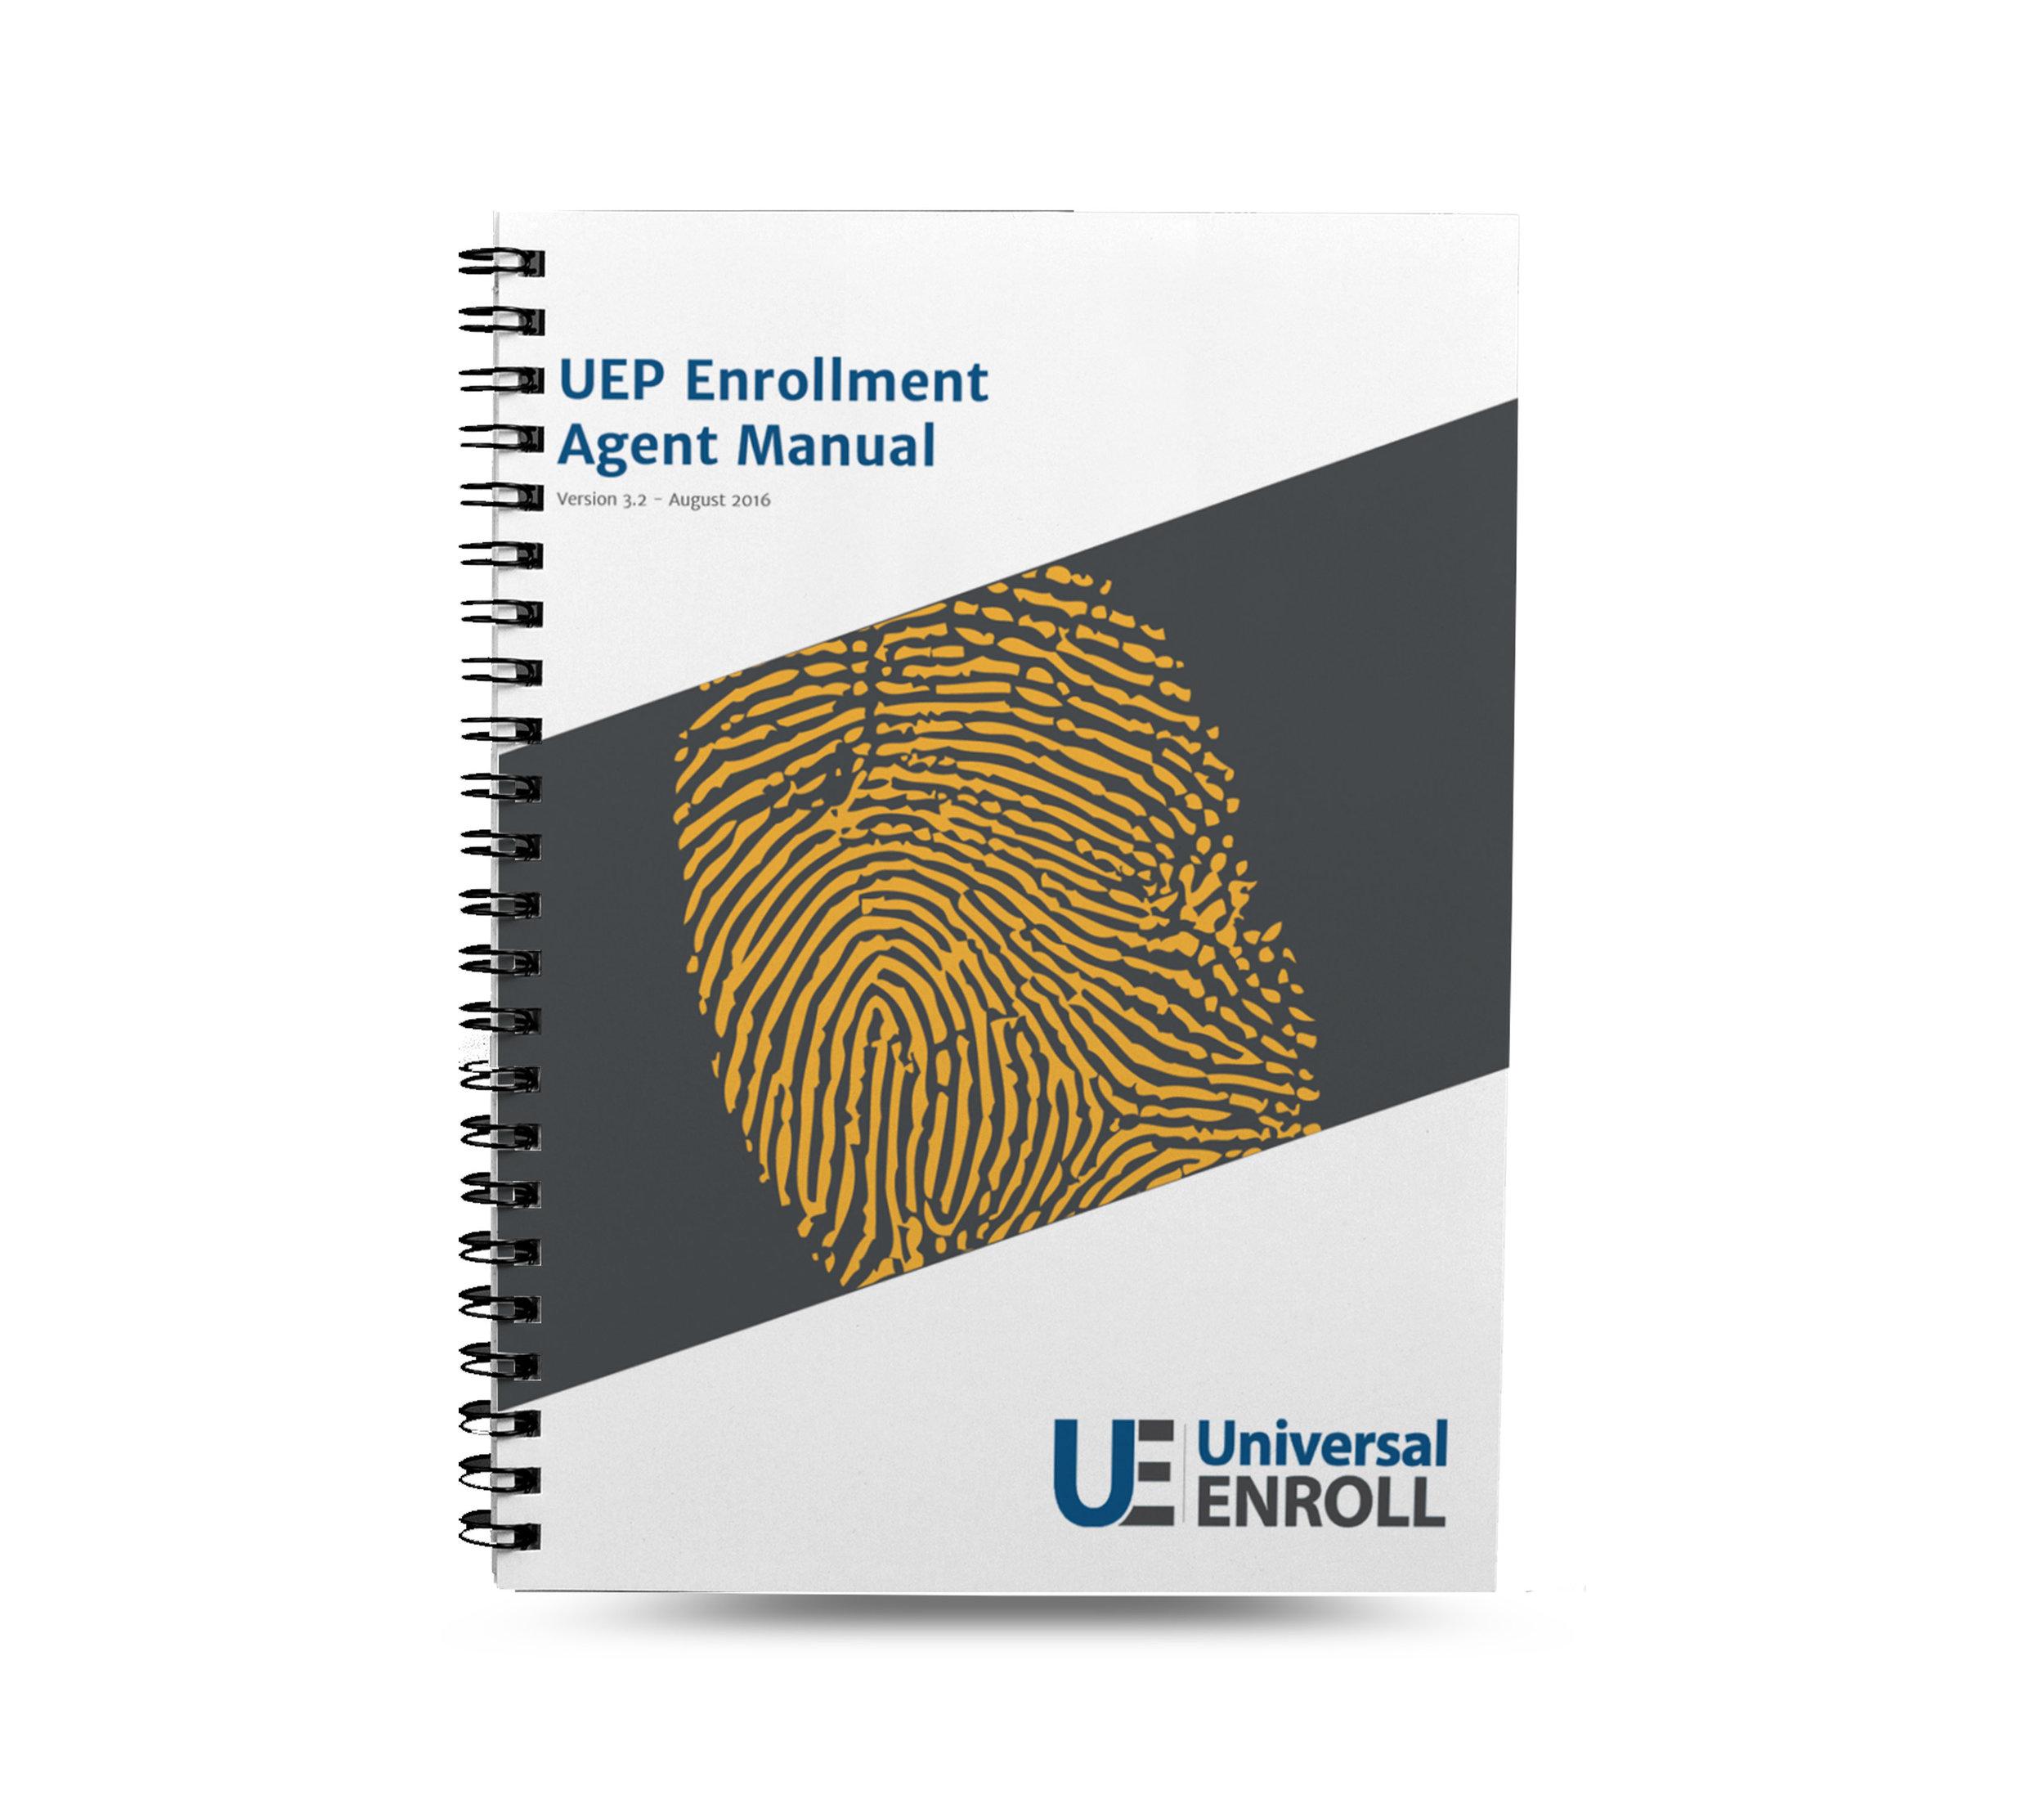 MorphoTrust USA | UEP Training Manual Redesign